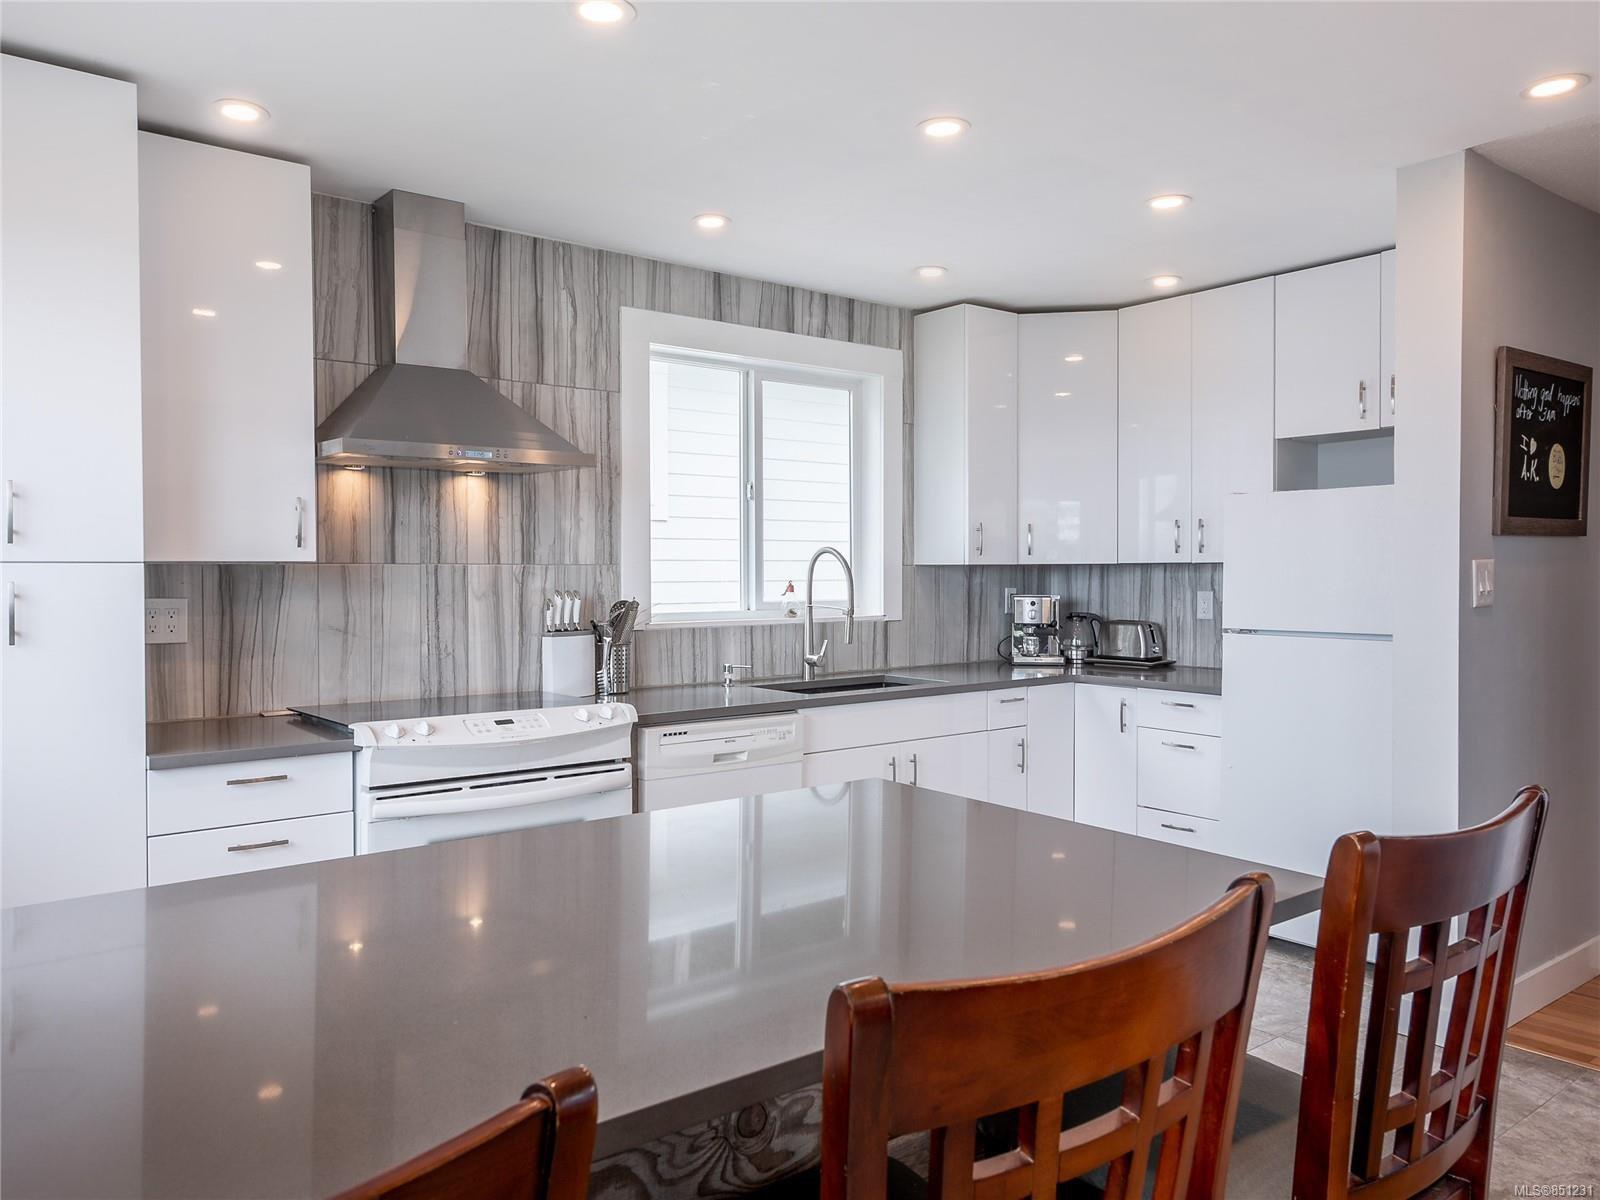 Main Photo: 5047 LOST LAKE Rd in : Na Hammond Bay House for sale (Nanaimo)  : MLS®# 851231